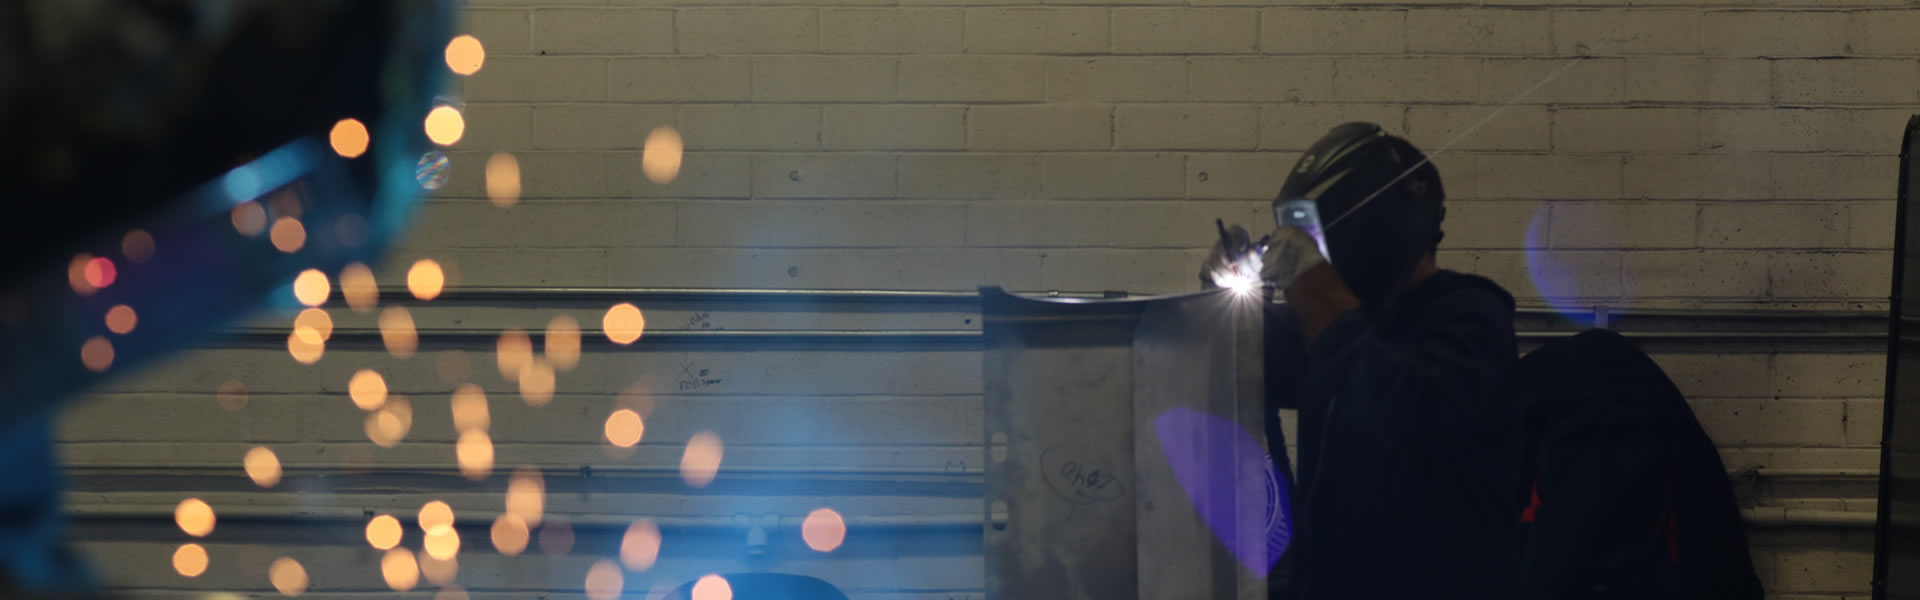 slider1-weld